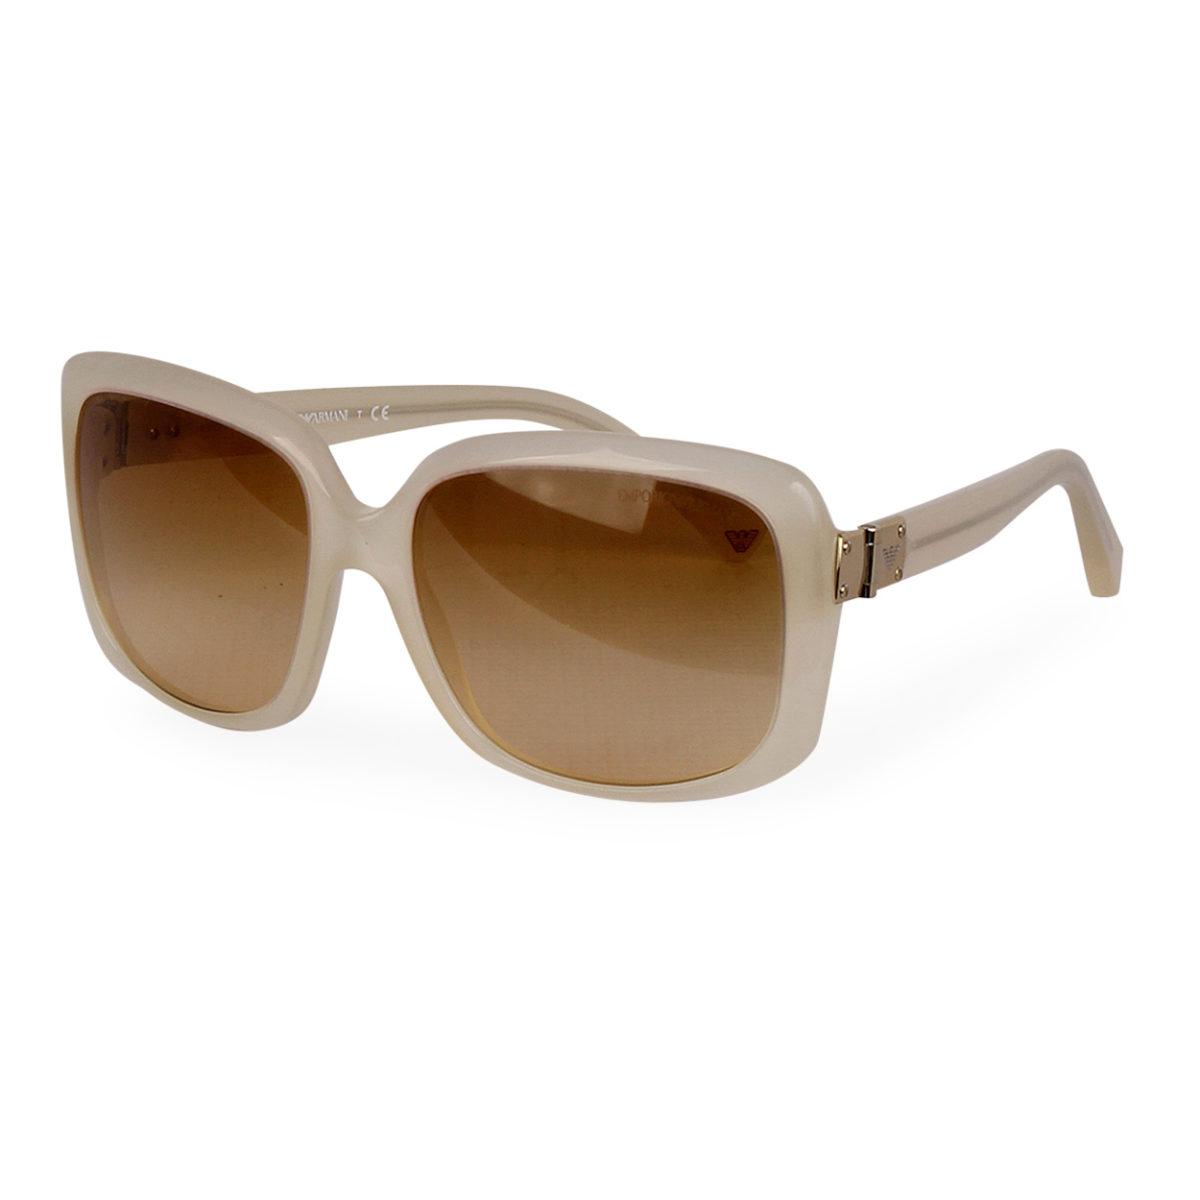 35b8d63aa73 EMPORIO ARMANI Sunglasses EA 4008 5082 Opal Beige